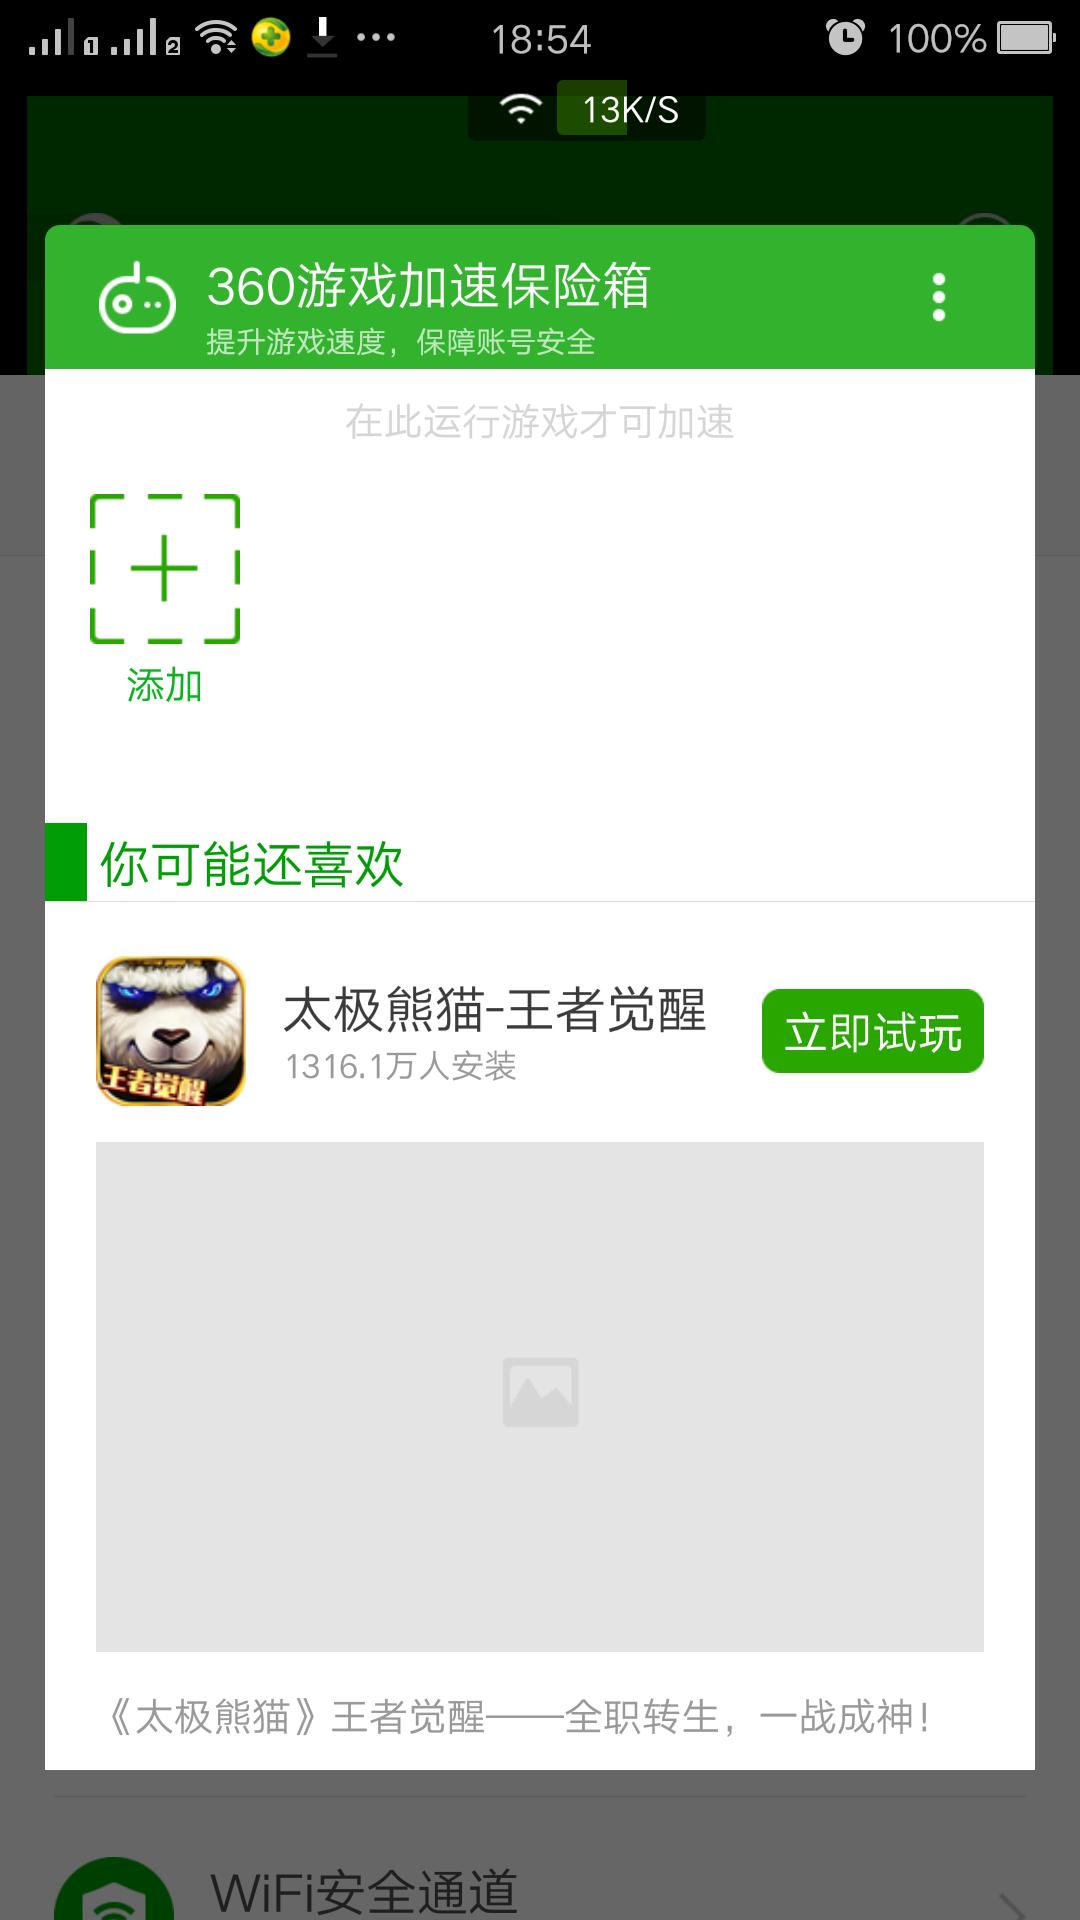 Screenshot_2015-12-20-18-54-35-769.png